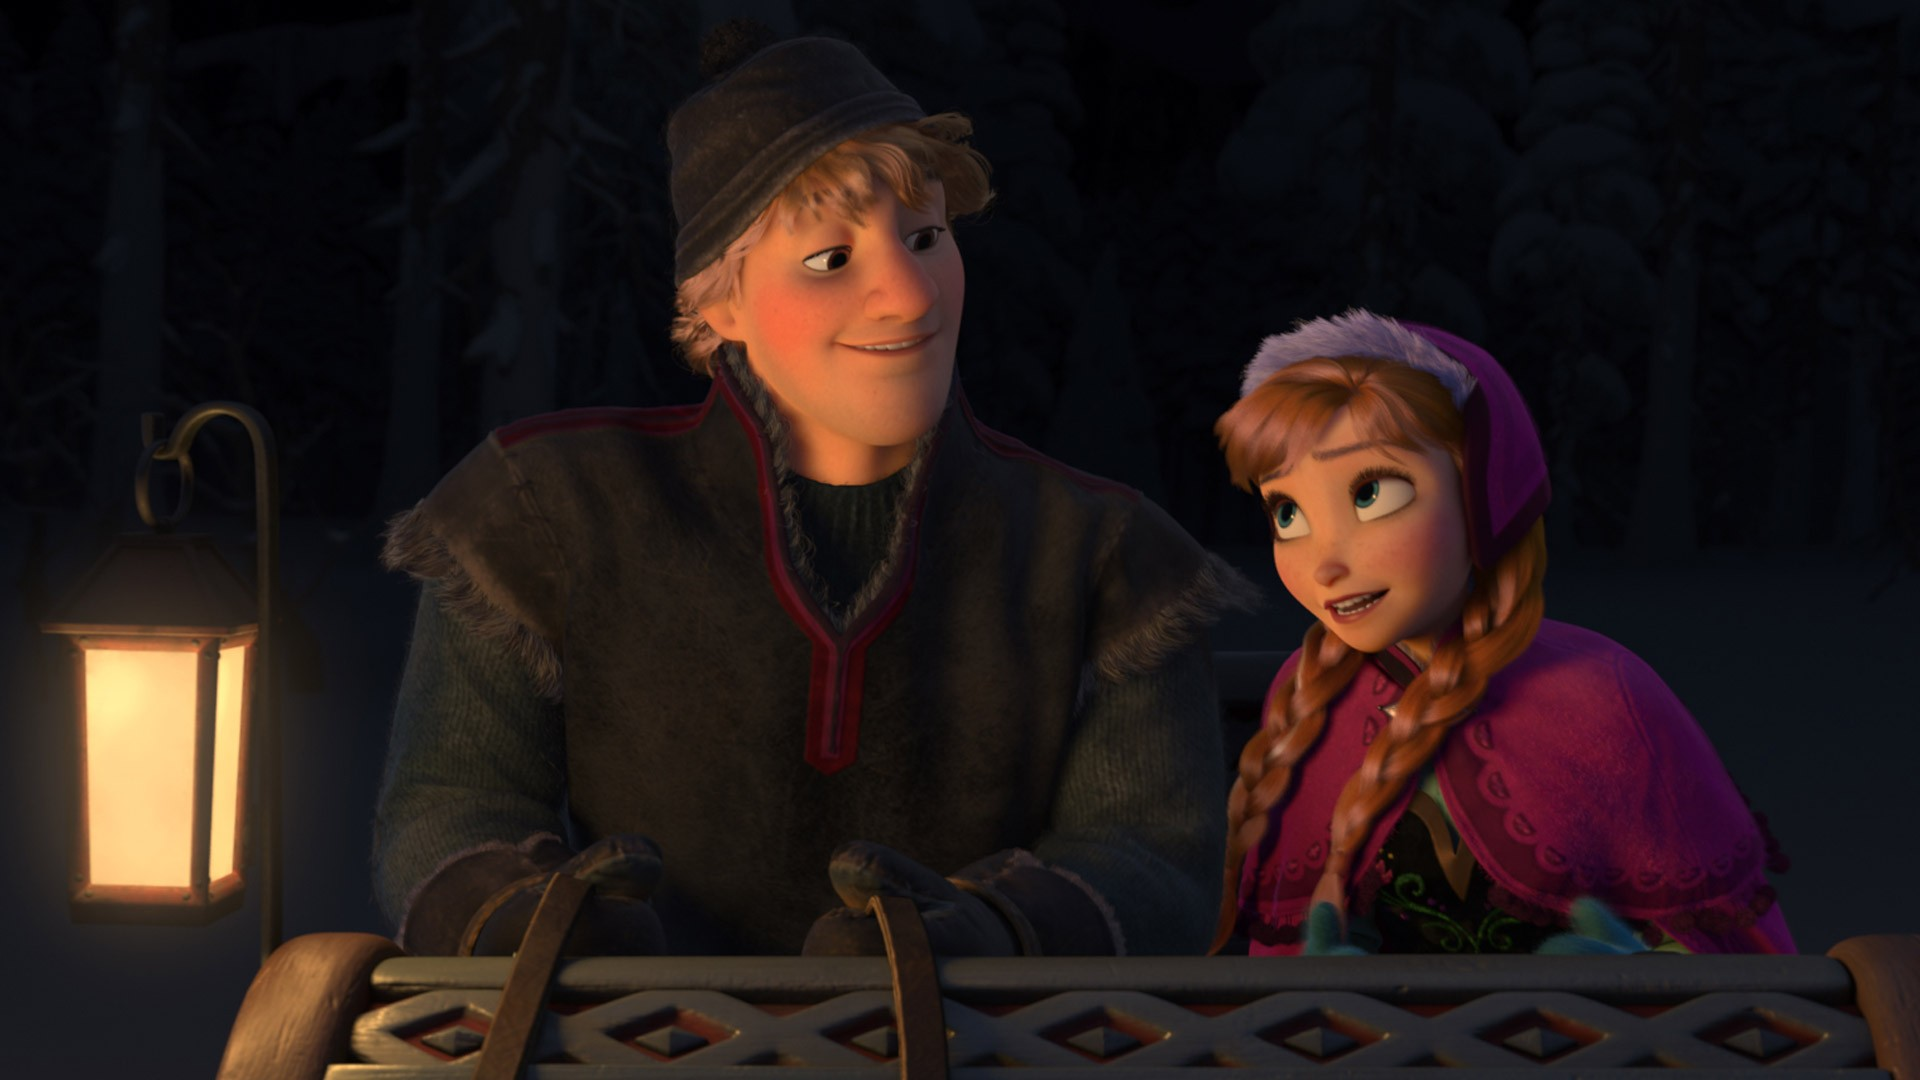 Frozen anna and kristoff ulgacao jpg